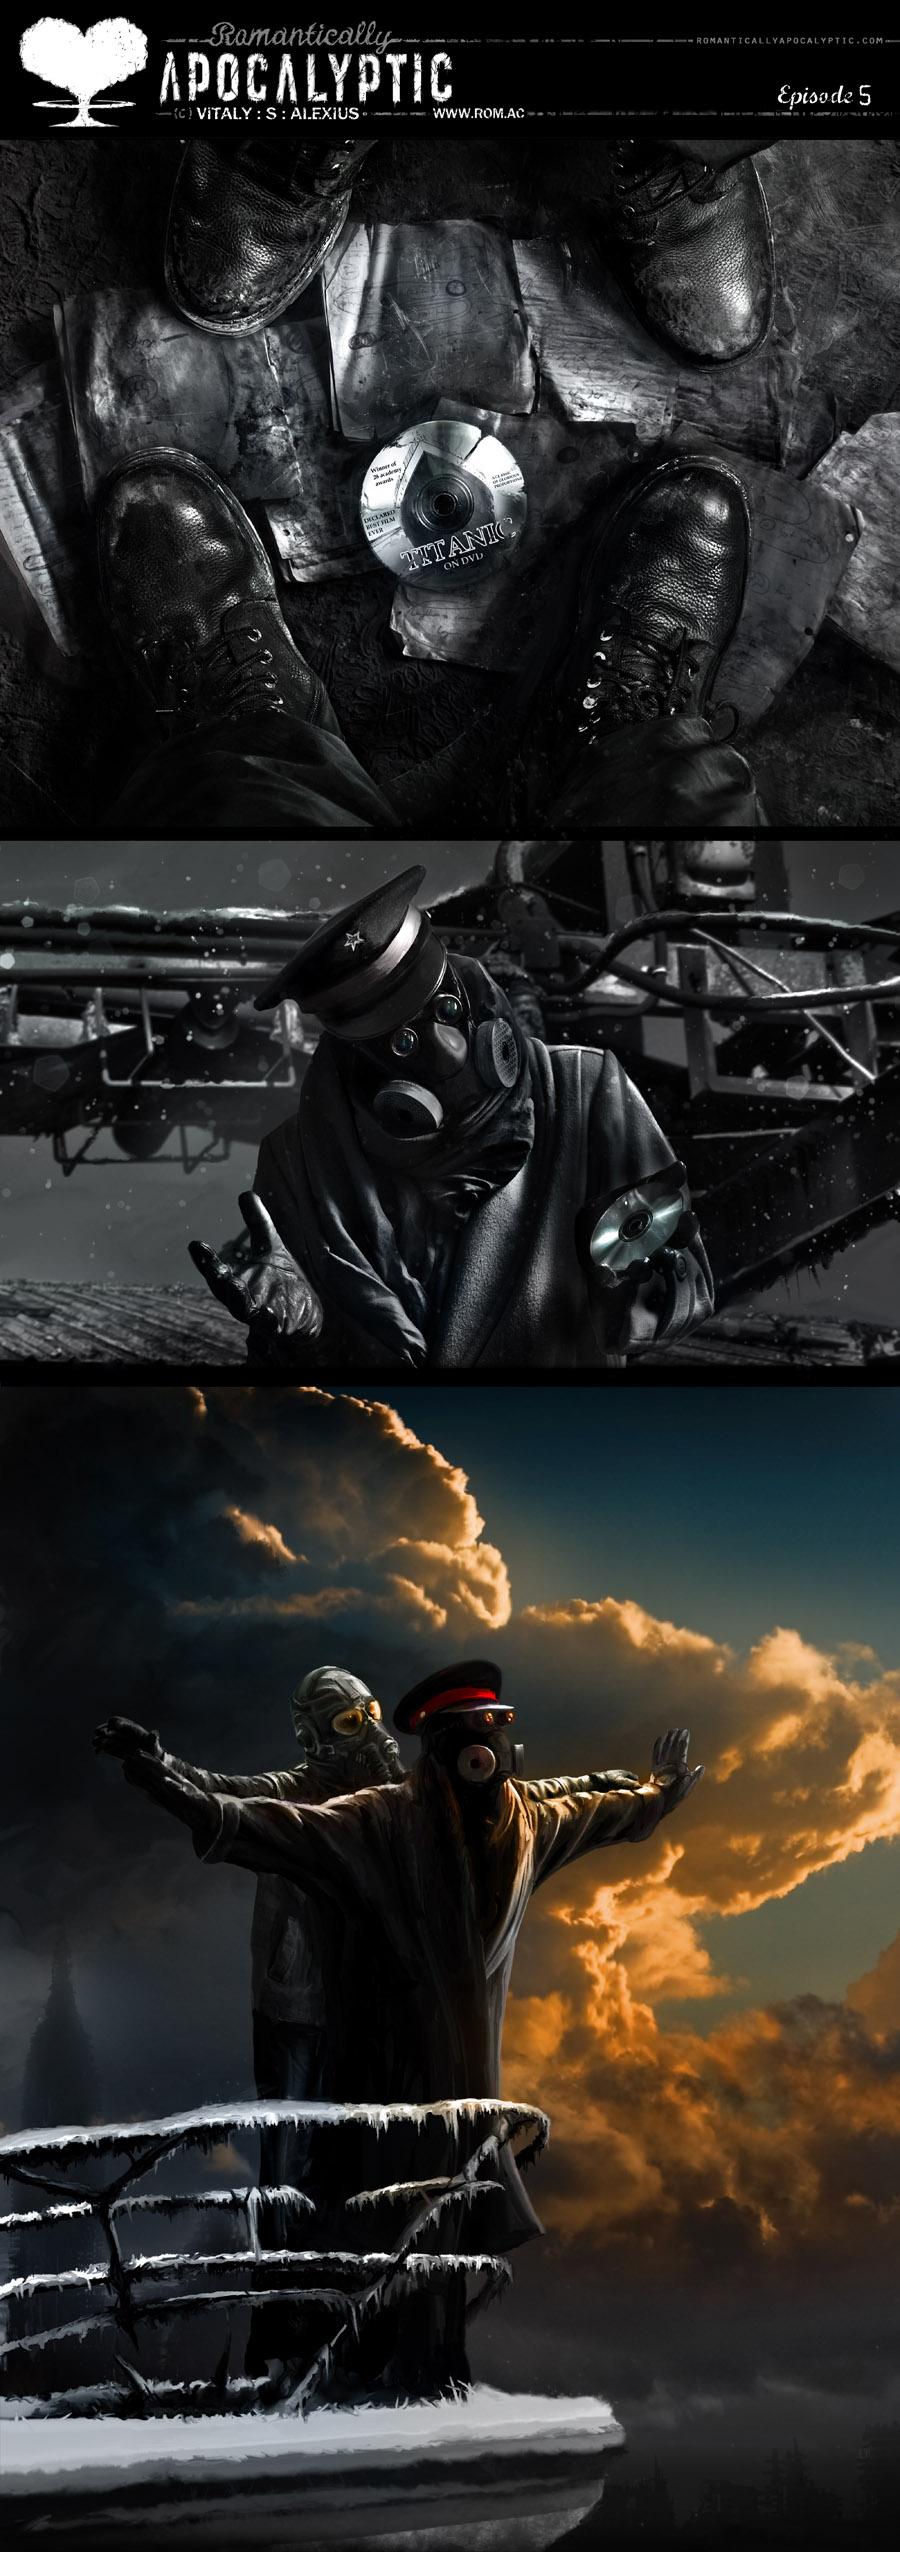 Romantically Apocalyptic 05 by alexiuss